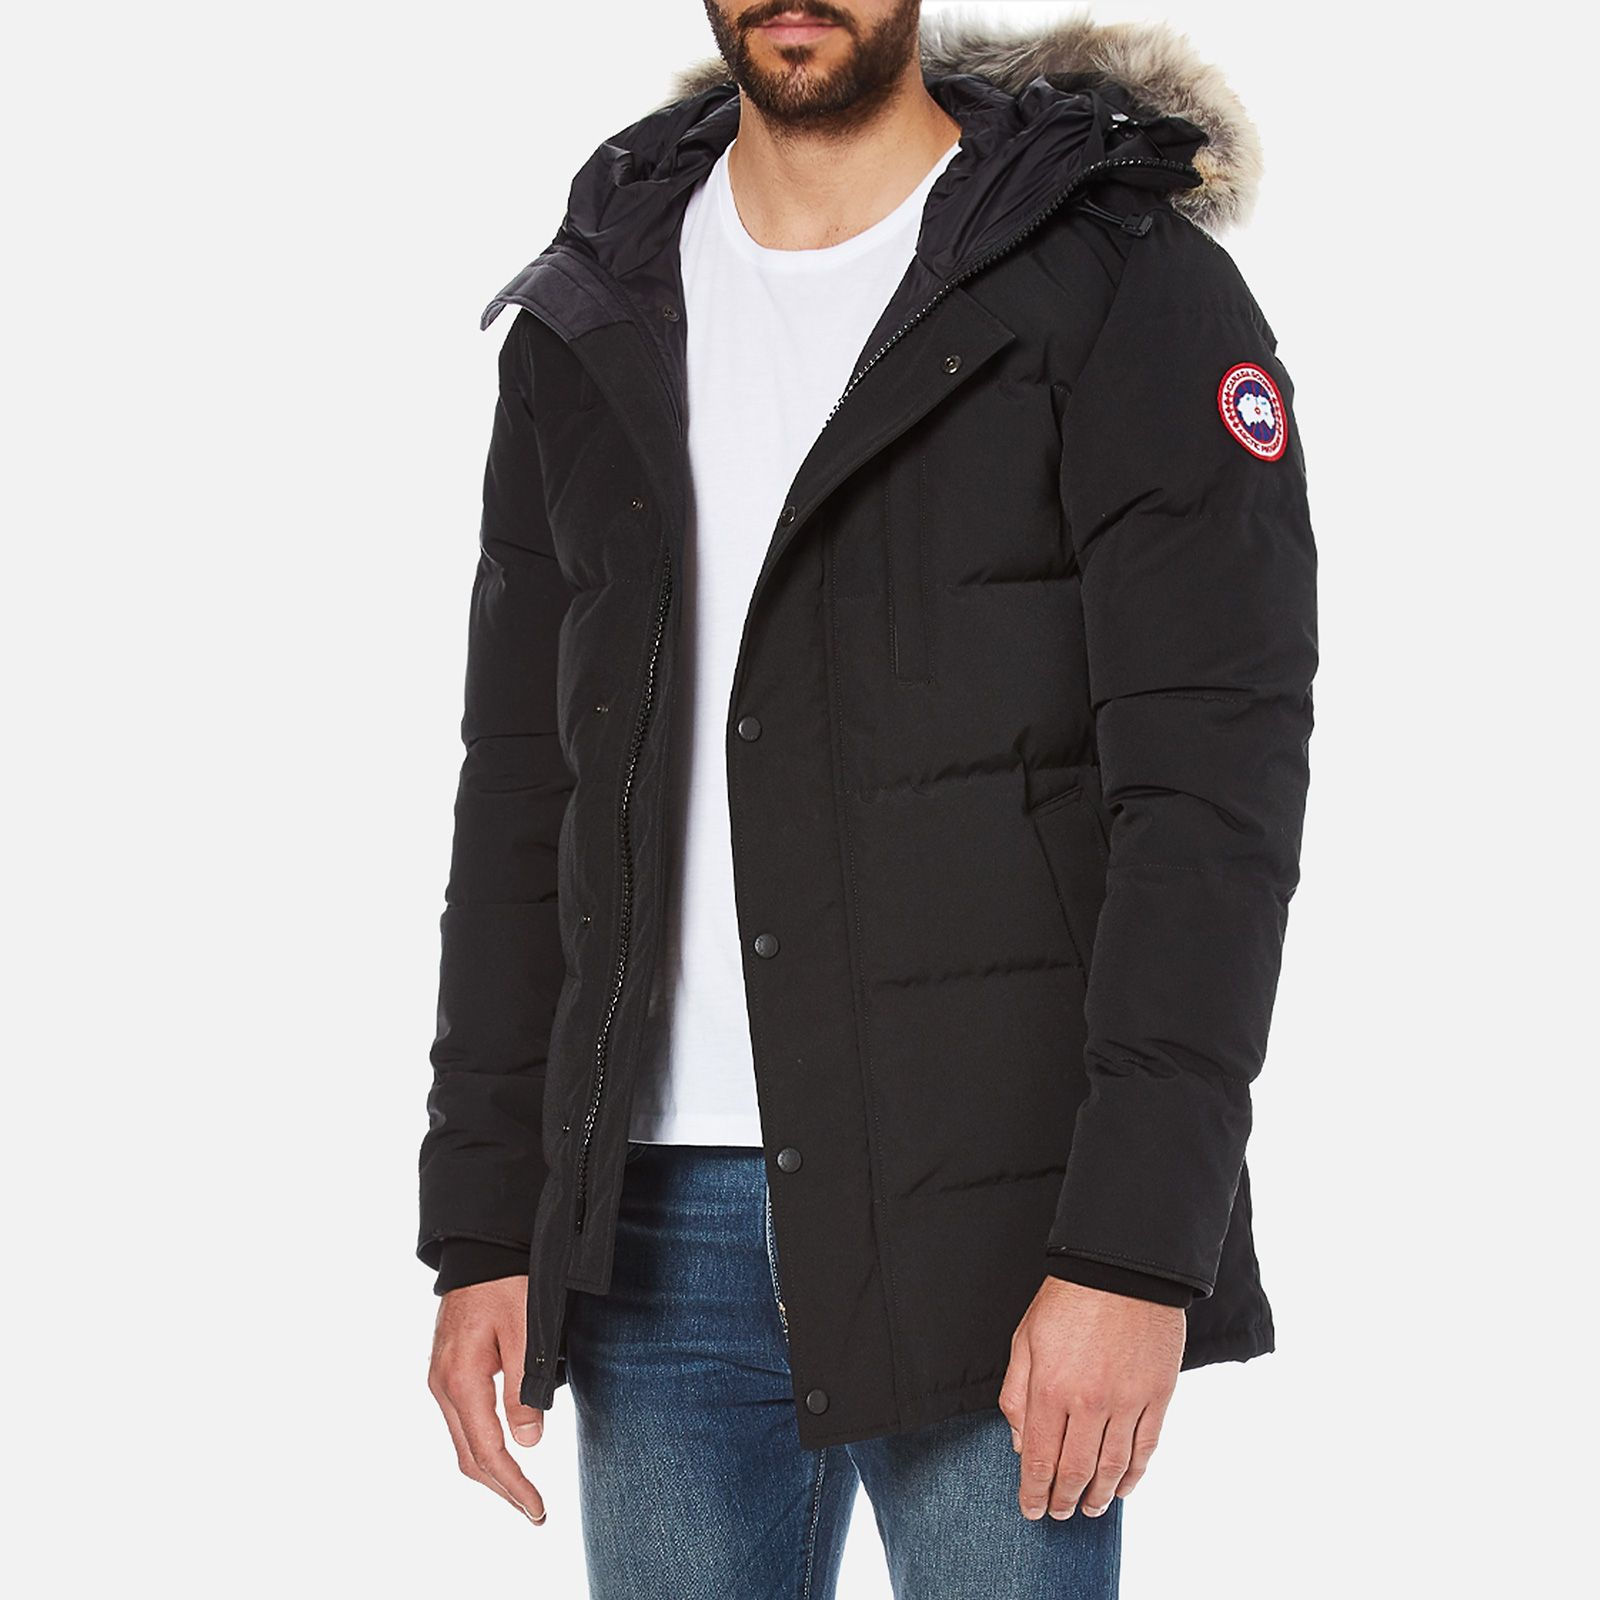 Canada Goose Men S Carson Parka Jacket Black Affiliate Ad Men Canada Goose Parka Jacket Jackets Canada Goose Mens